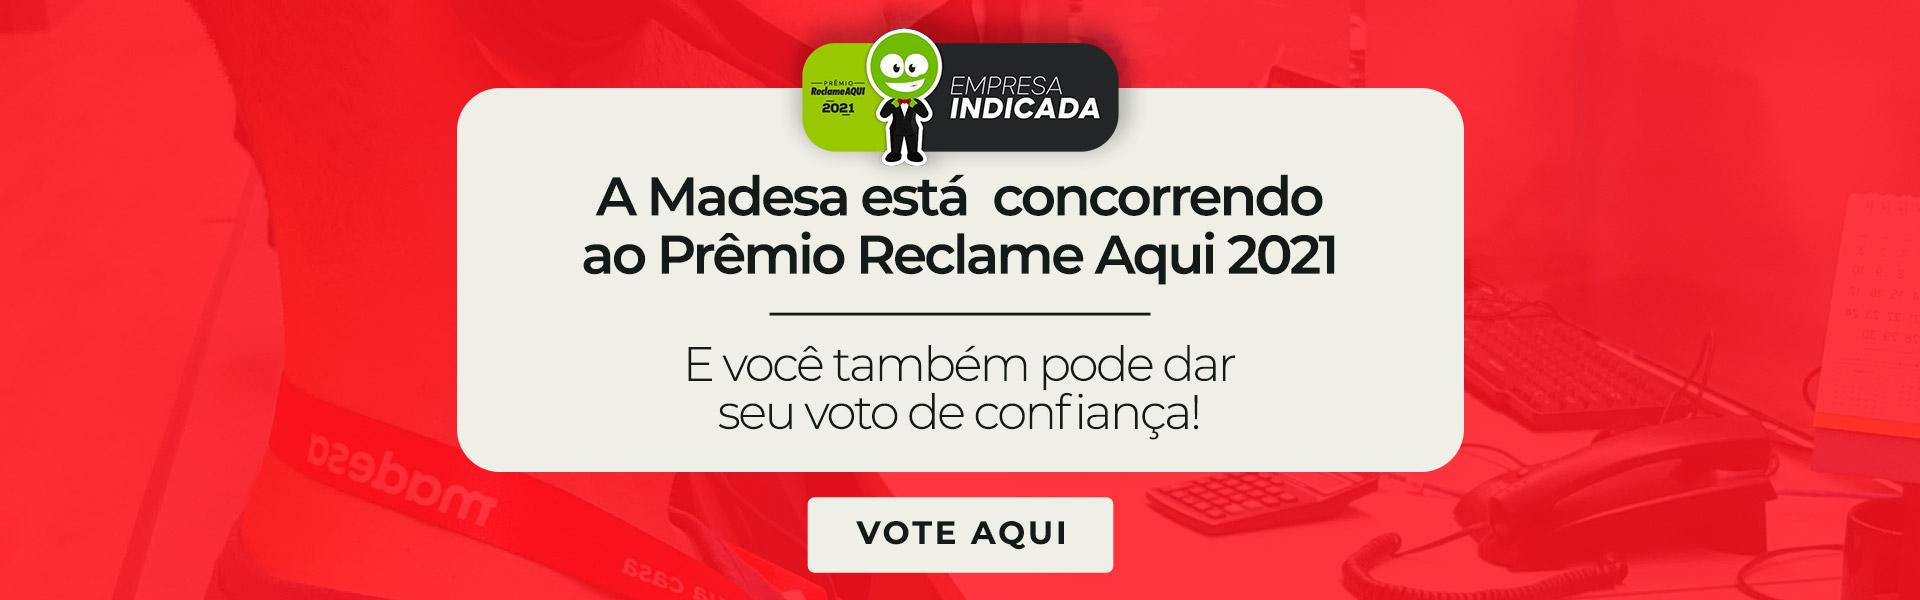 RA_EMPRES_INDICADA_VOTACAO